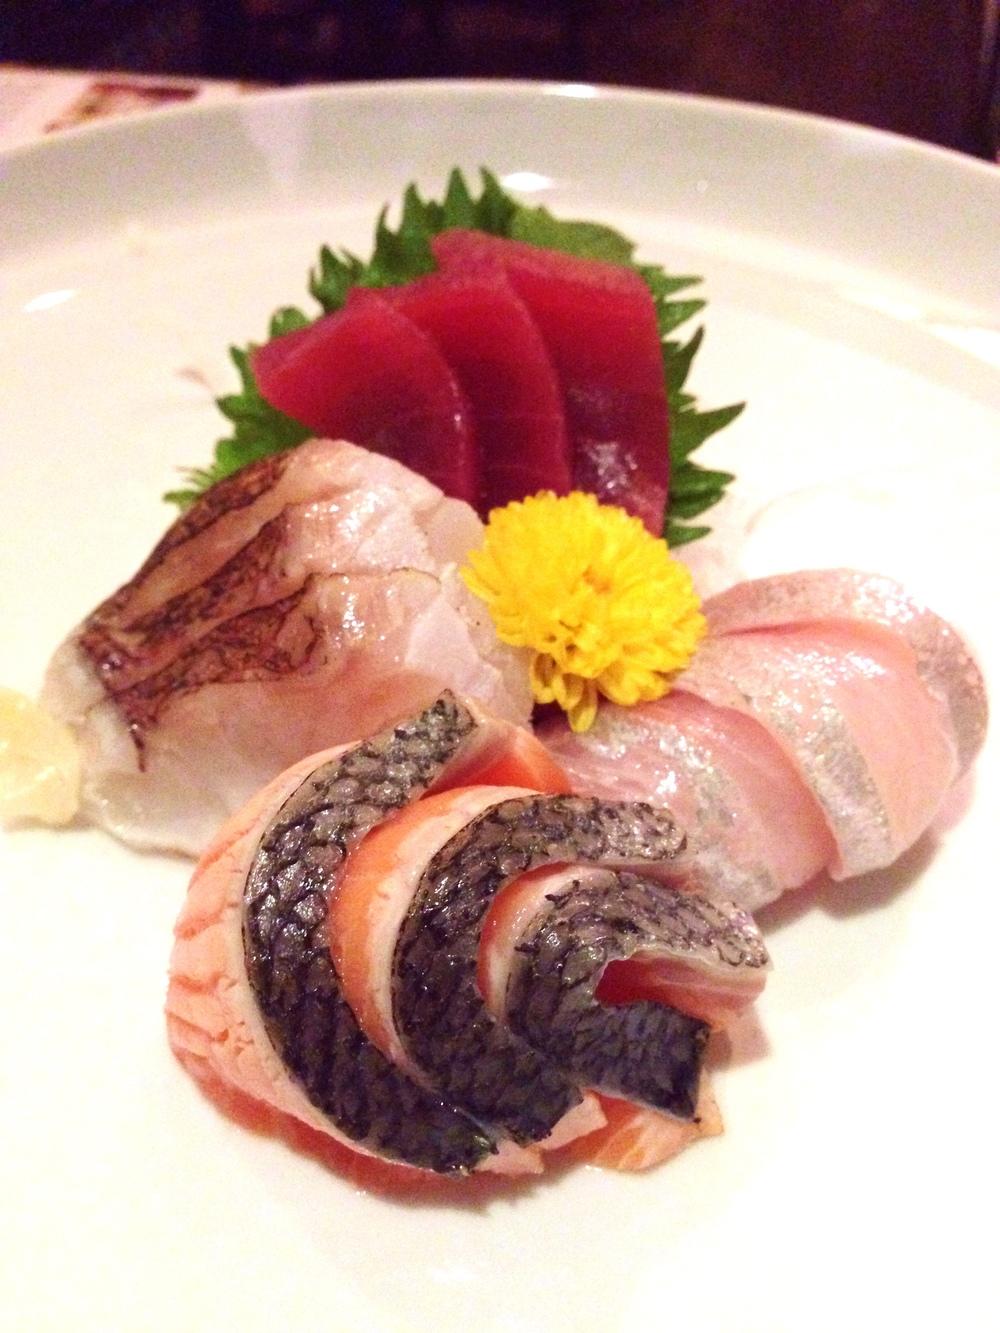 Chef's sashimi selection of the day